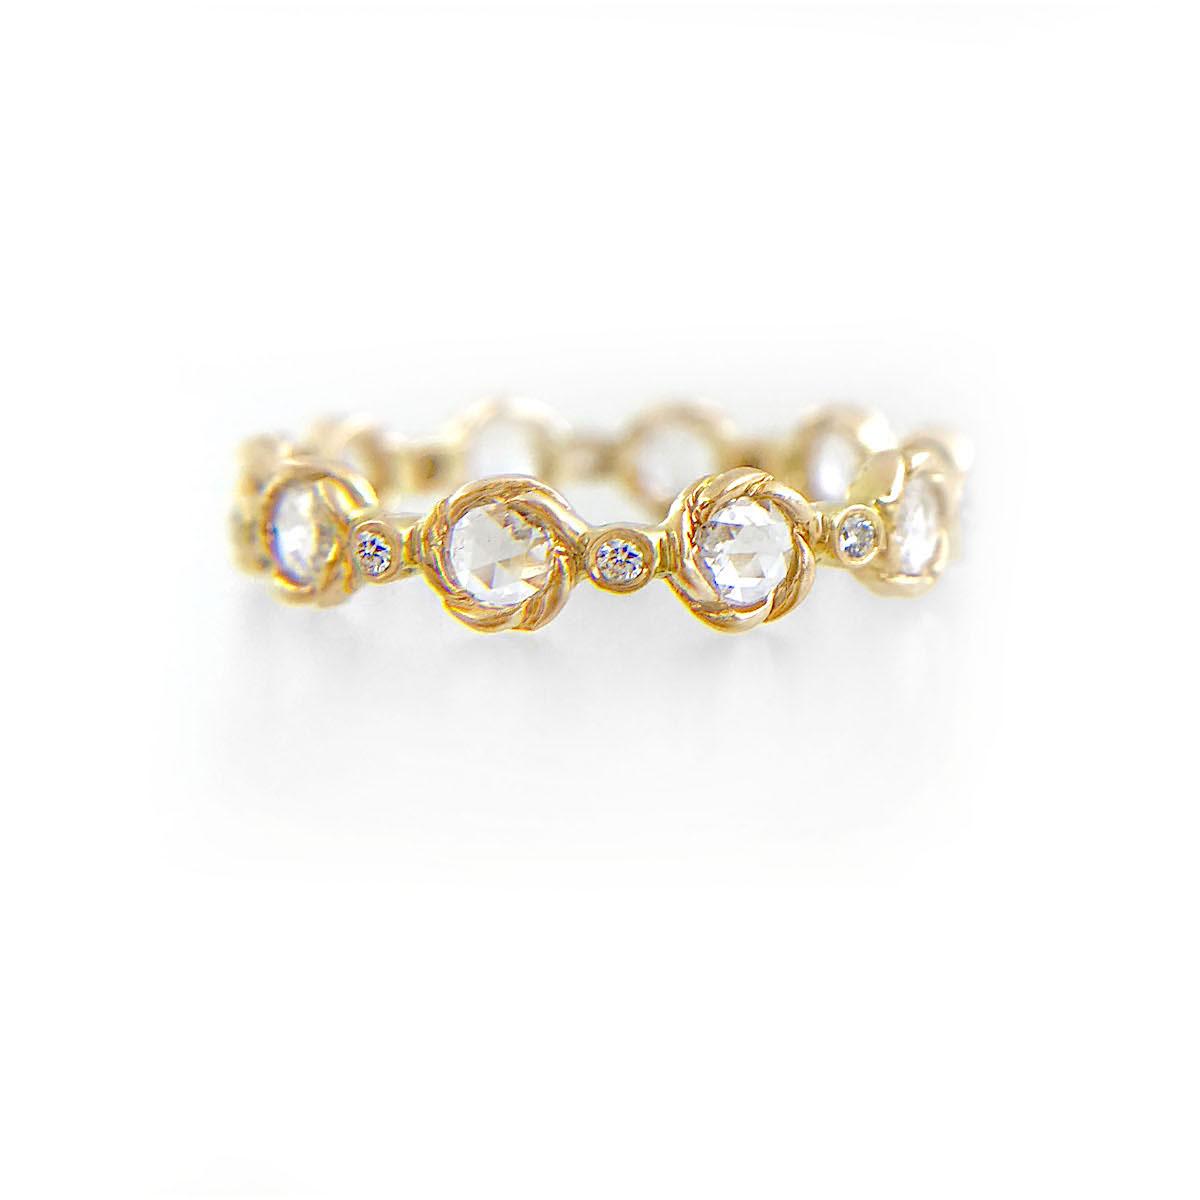 21-Signature-Twist-Bezel-4mm-Rose-Cut-Diamond-Eternity-Gold-Ring-14k-18k-JeweLyrie_3382-1